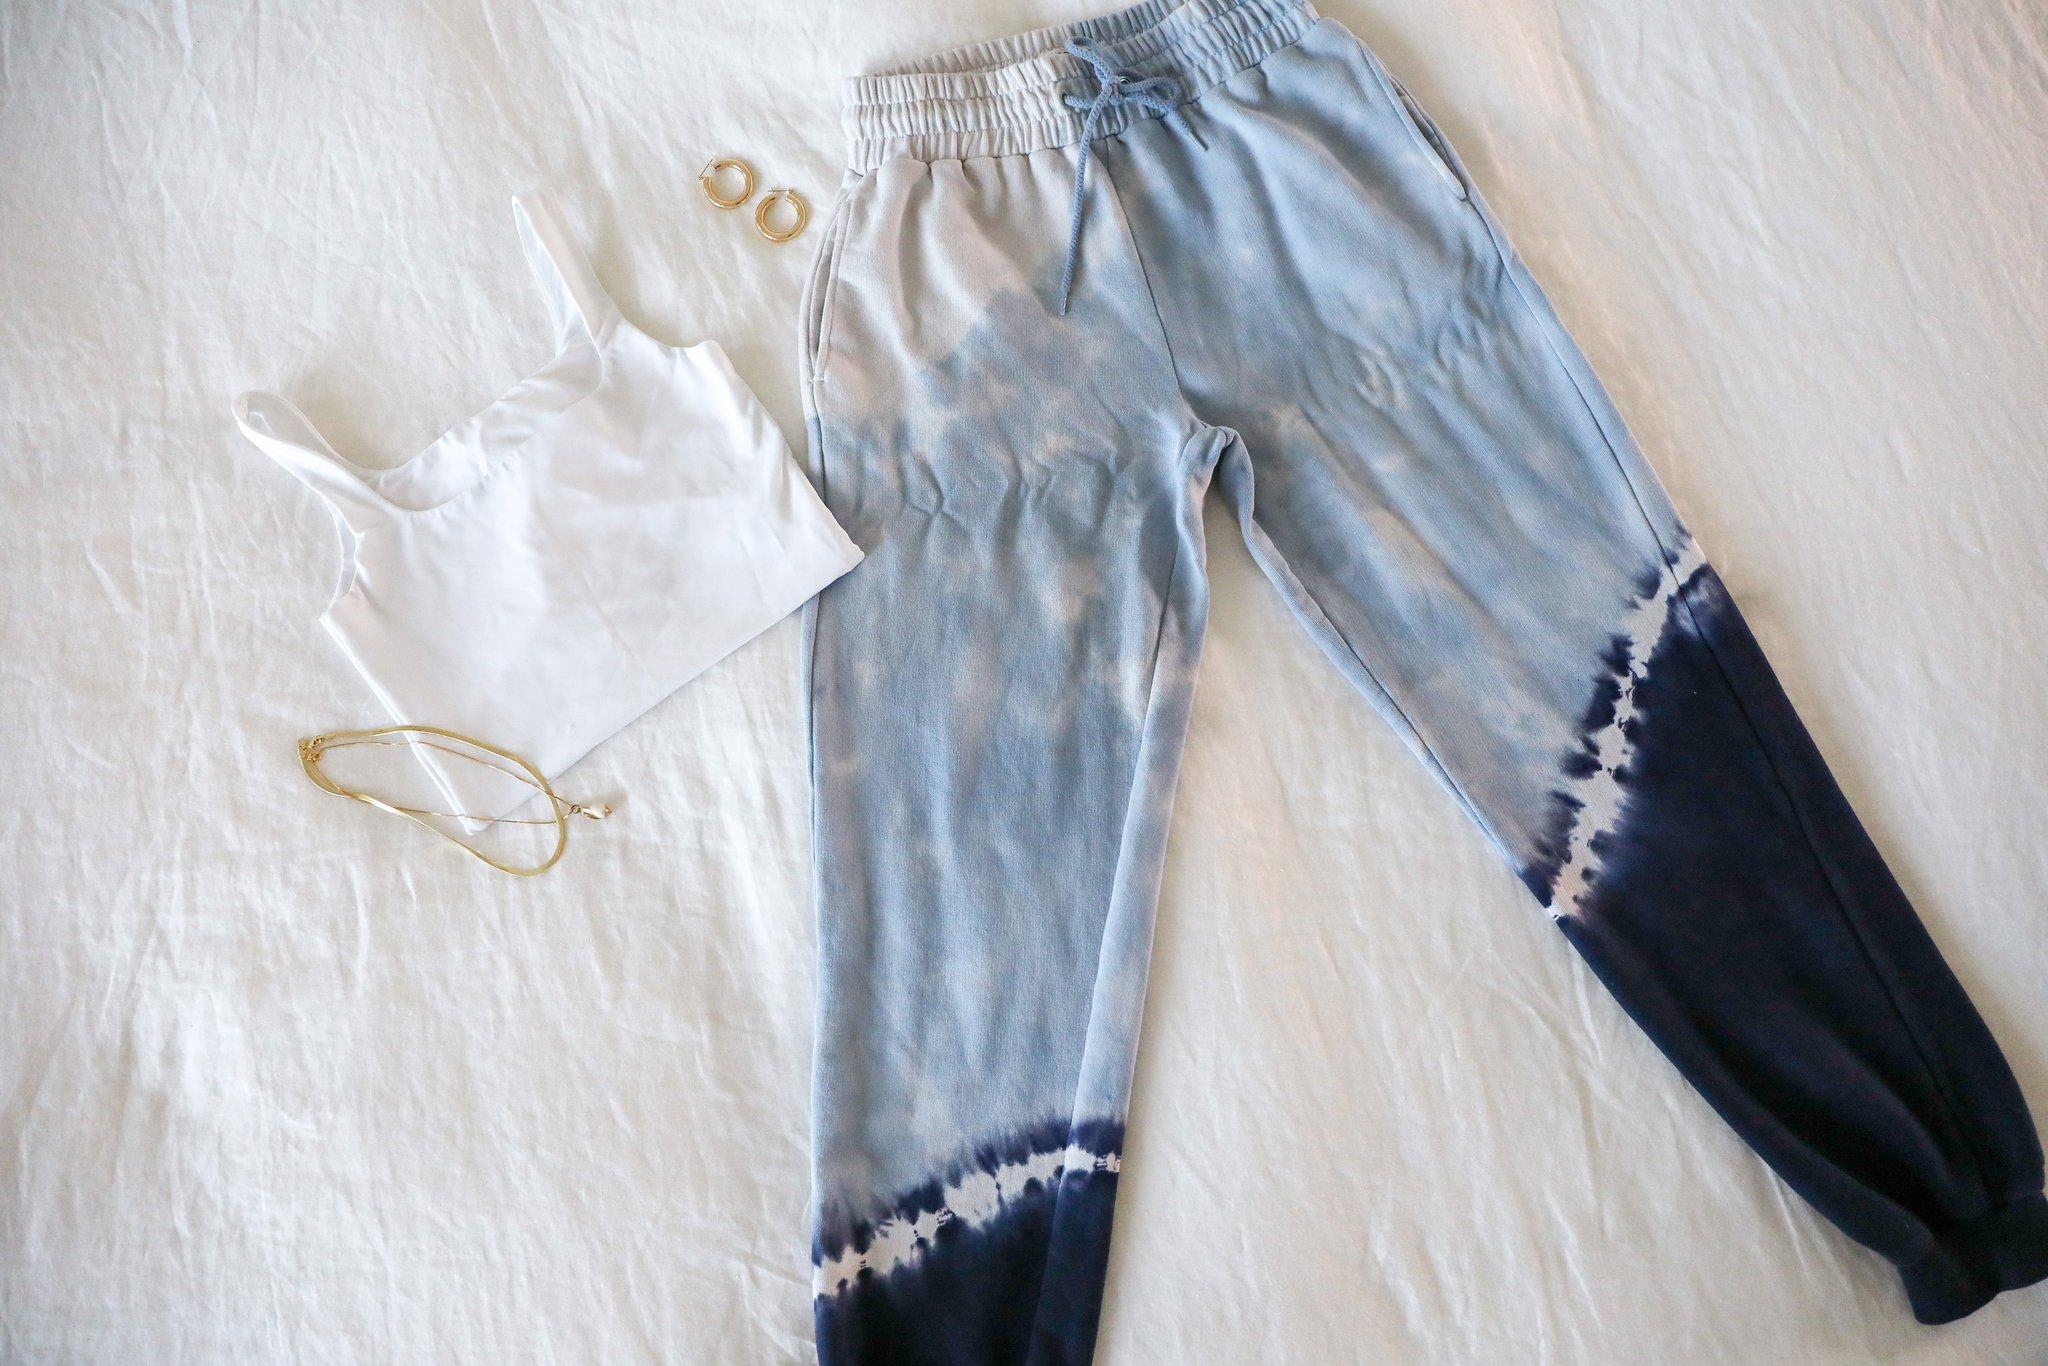 LSPACE sweatpants flat lay